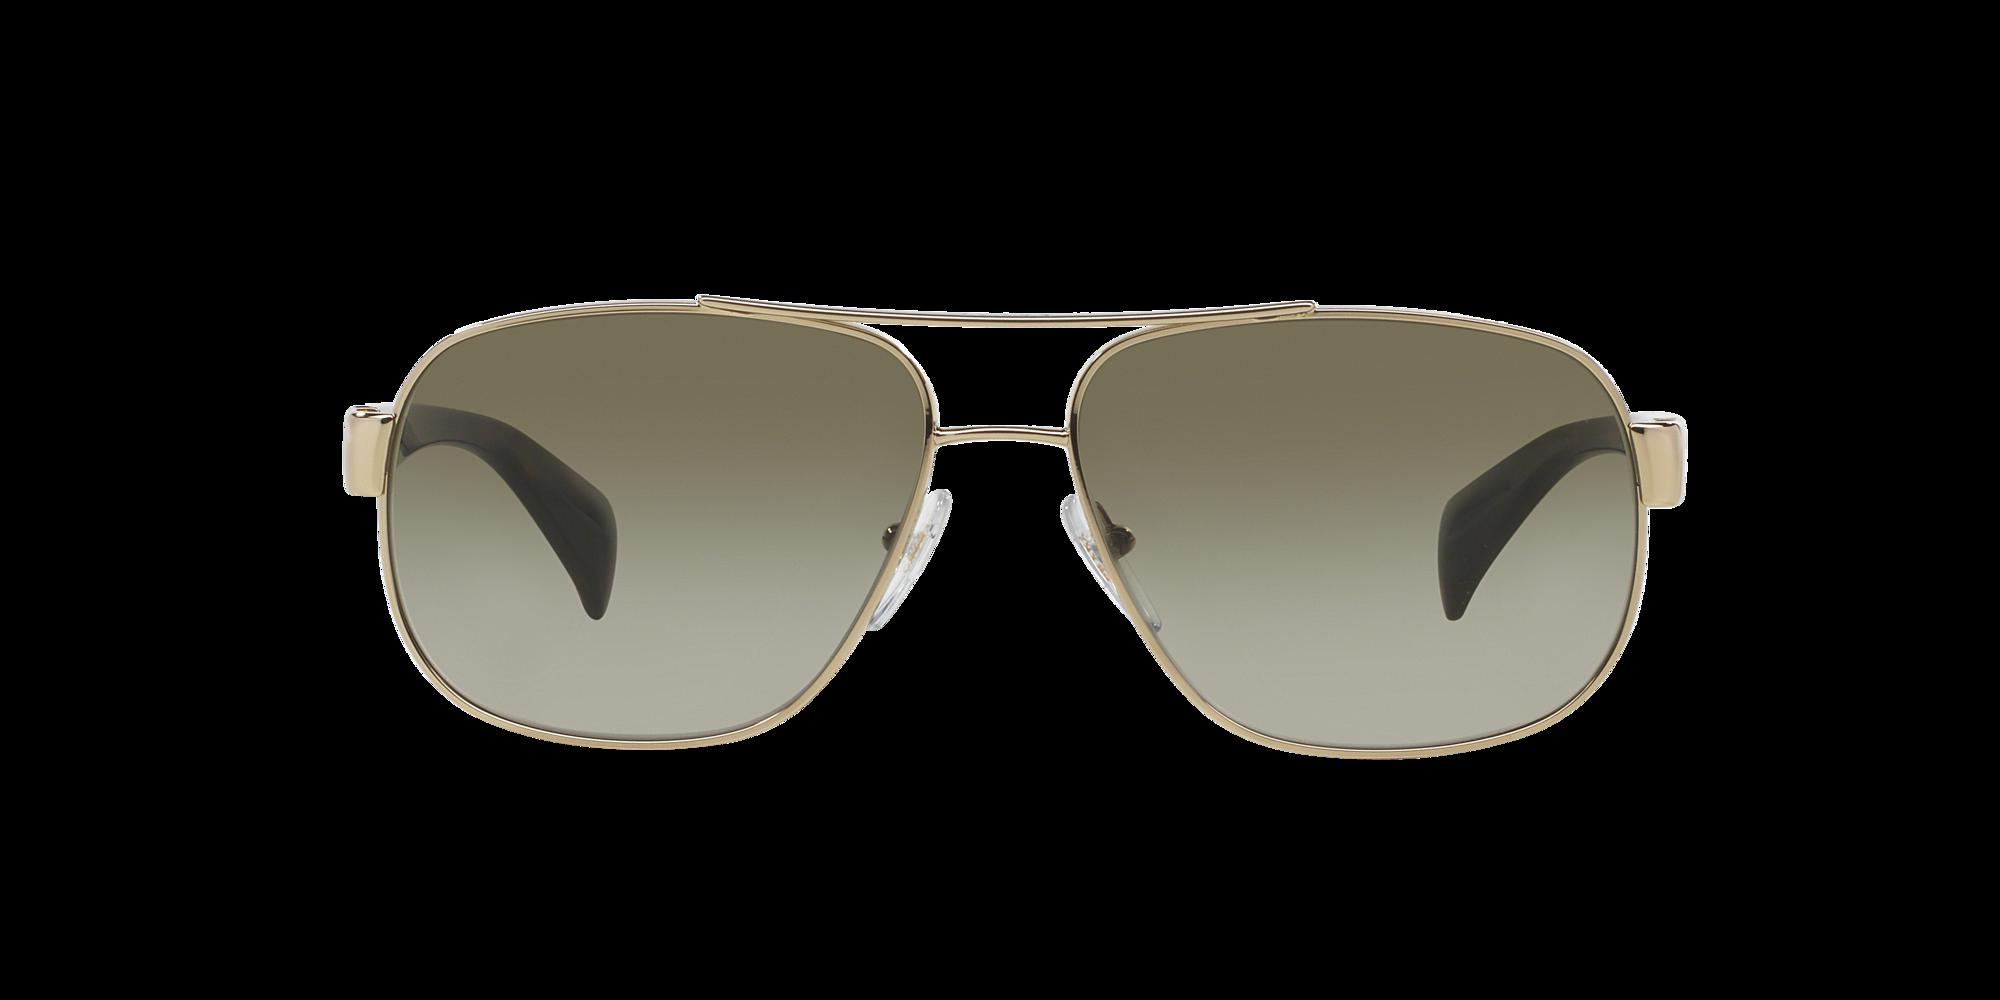 Image for PR 52PS from LensCrafters | Glasses, Prescription Glasses Online, Eyewear